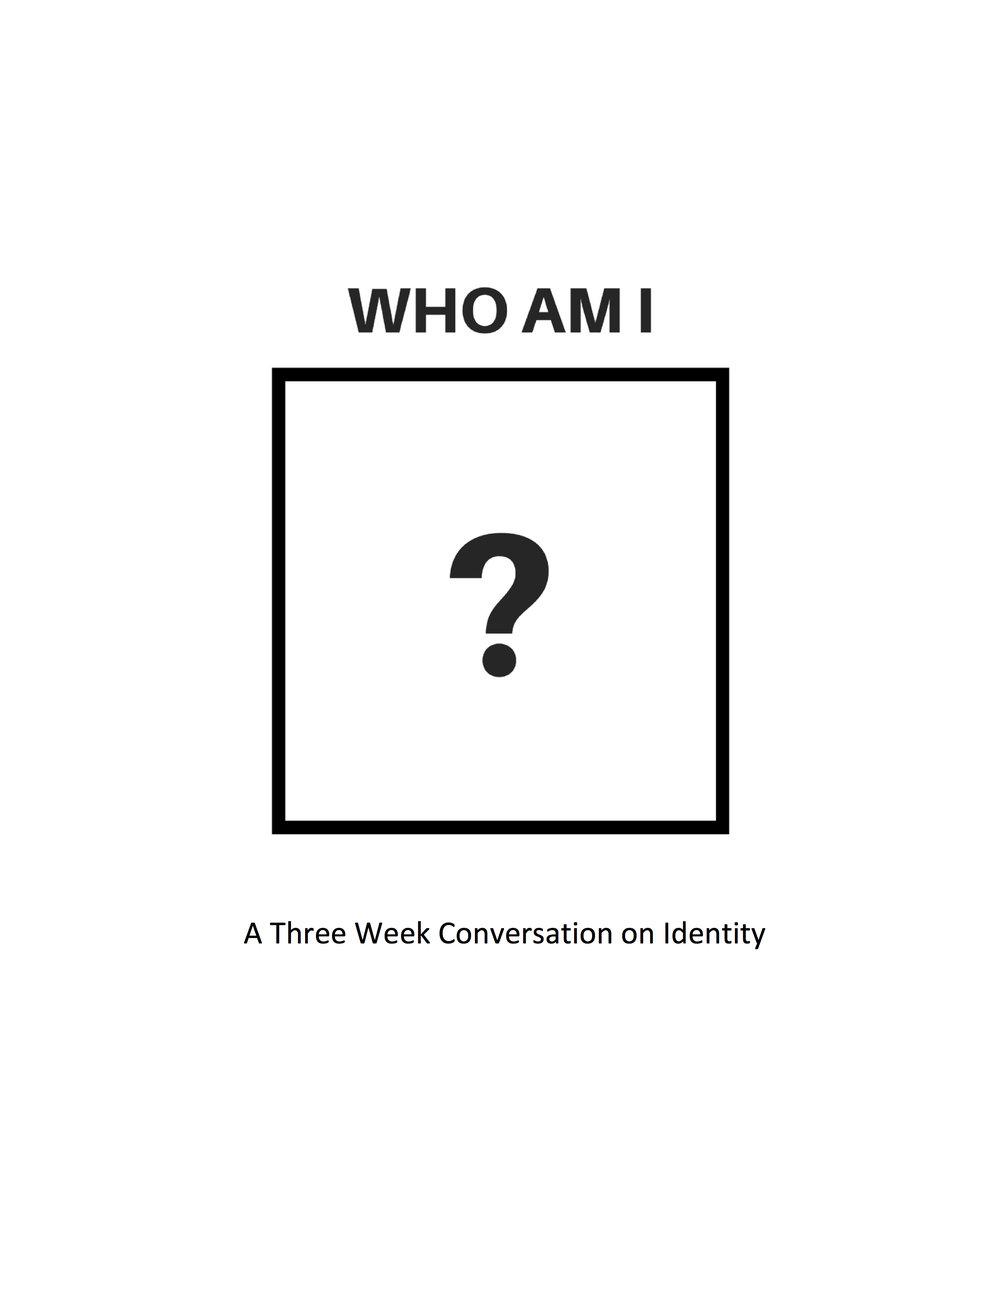 WHO AM I %3f Curriculum.jpg